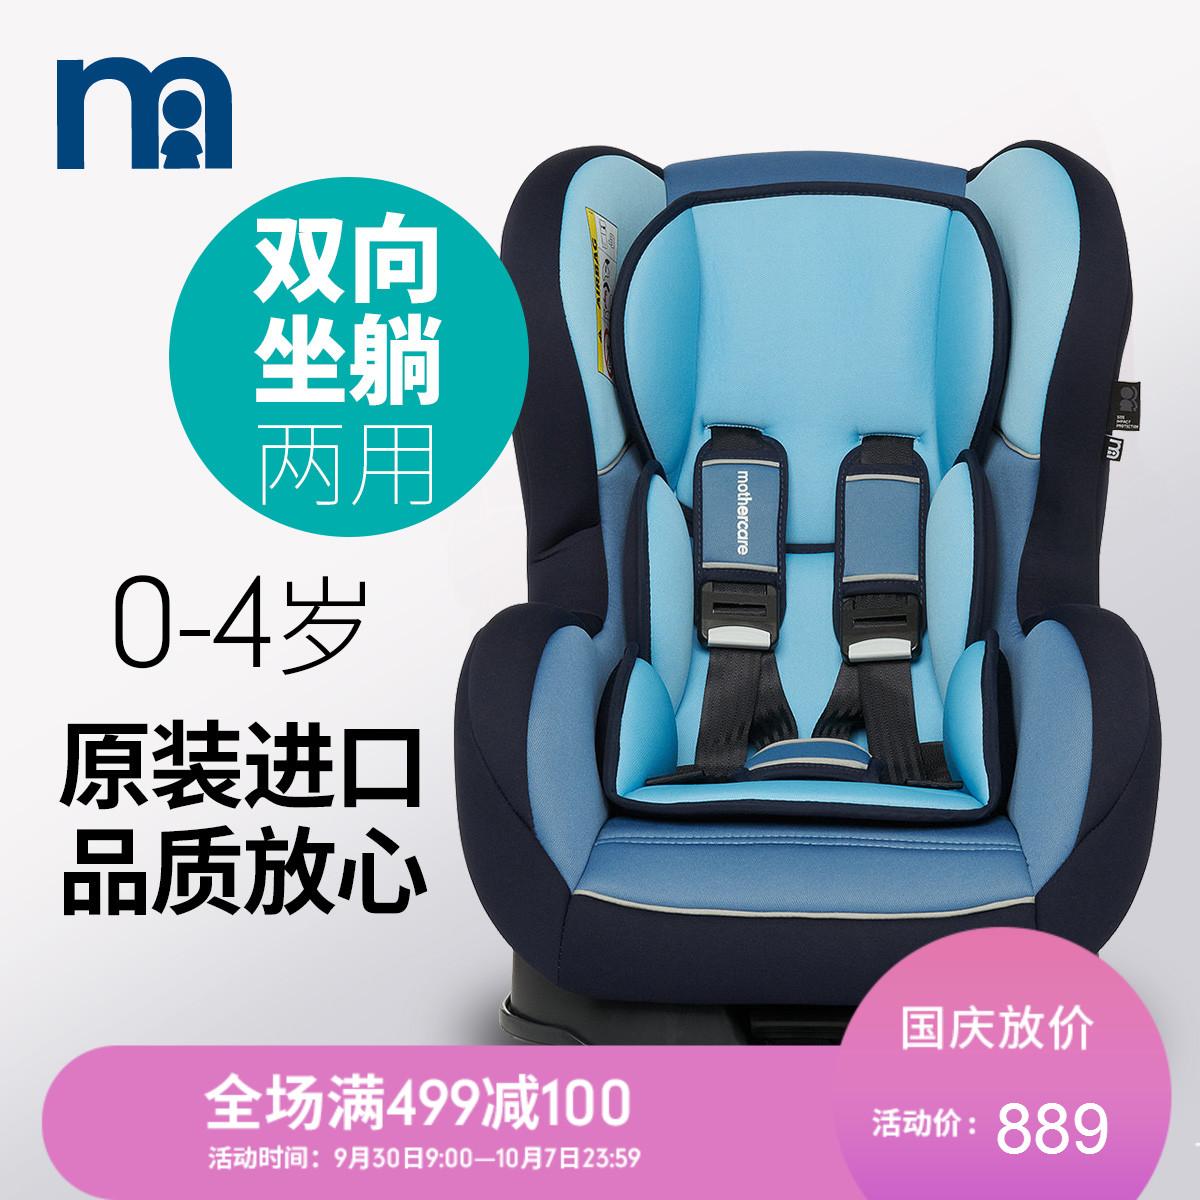 mothercare好孩子儿童进口安全座椅可坐躺双向安装汽车用座椅04岁